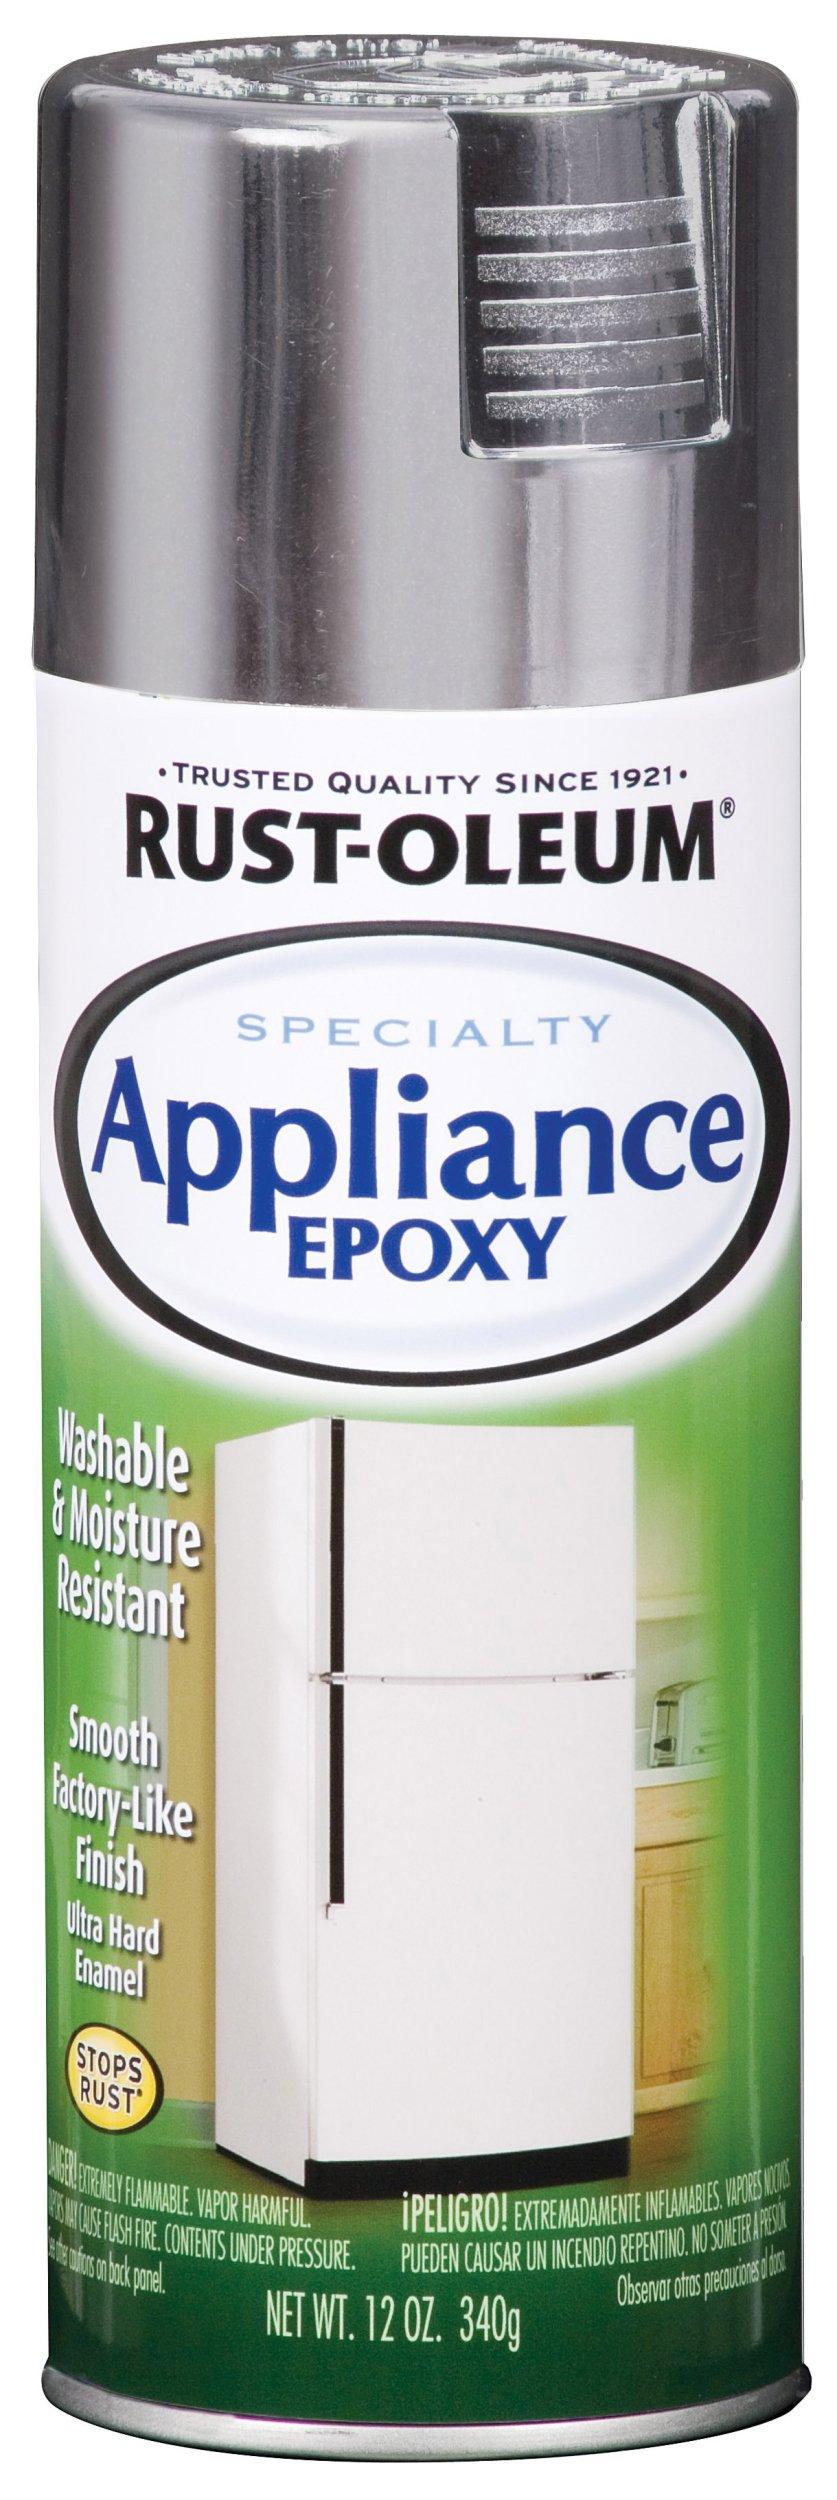 Rust-Oleum 7887830 Appliance Enamel 12-Ounce Spray, Stainless